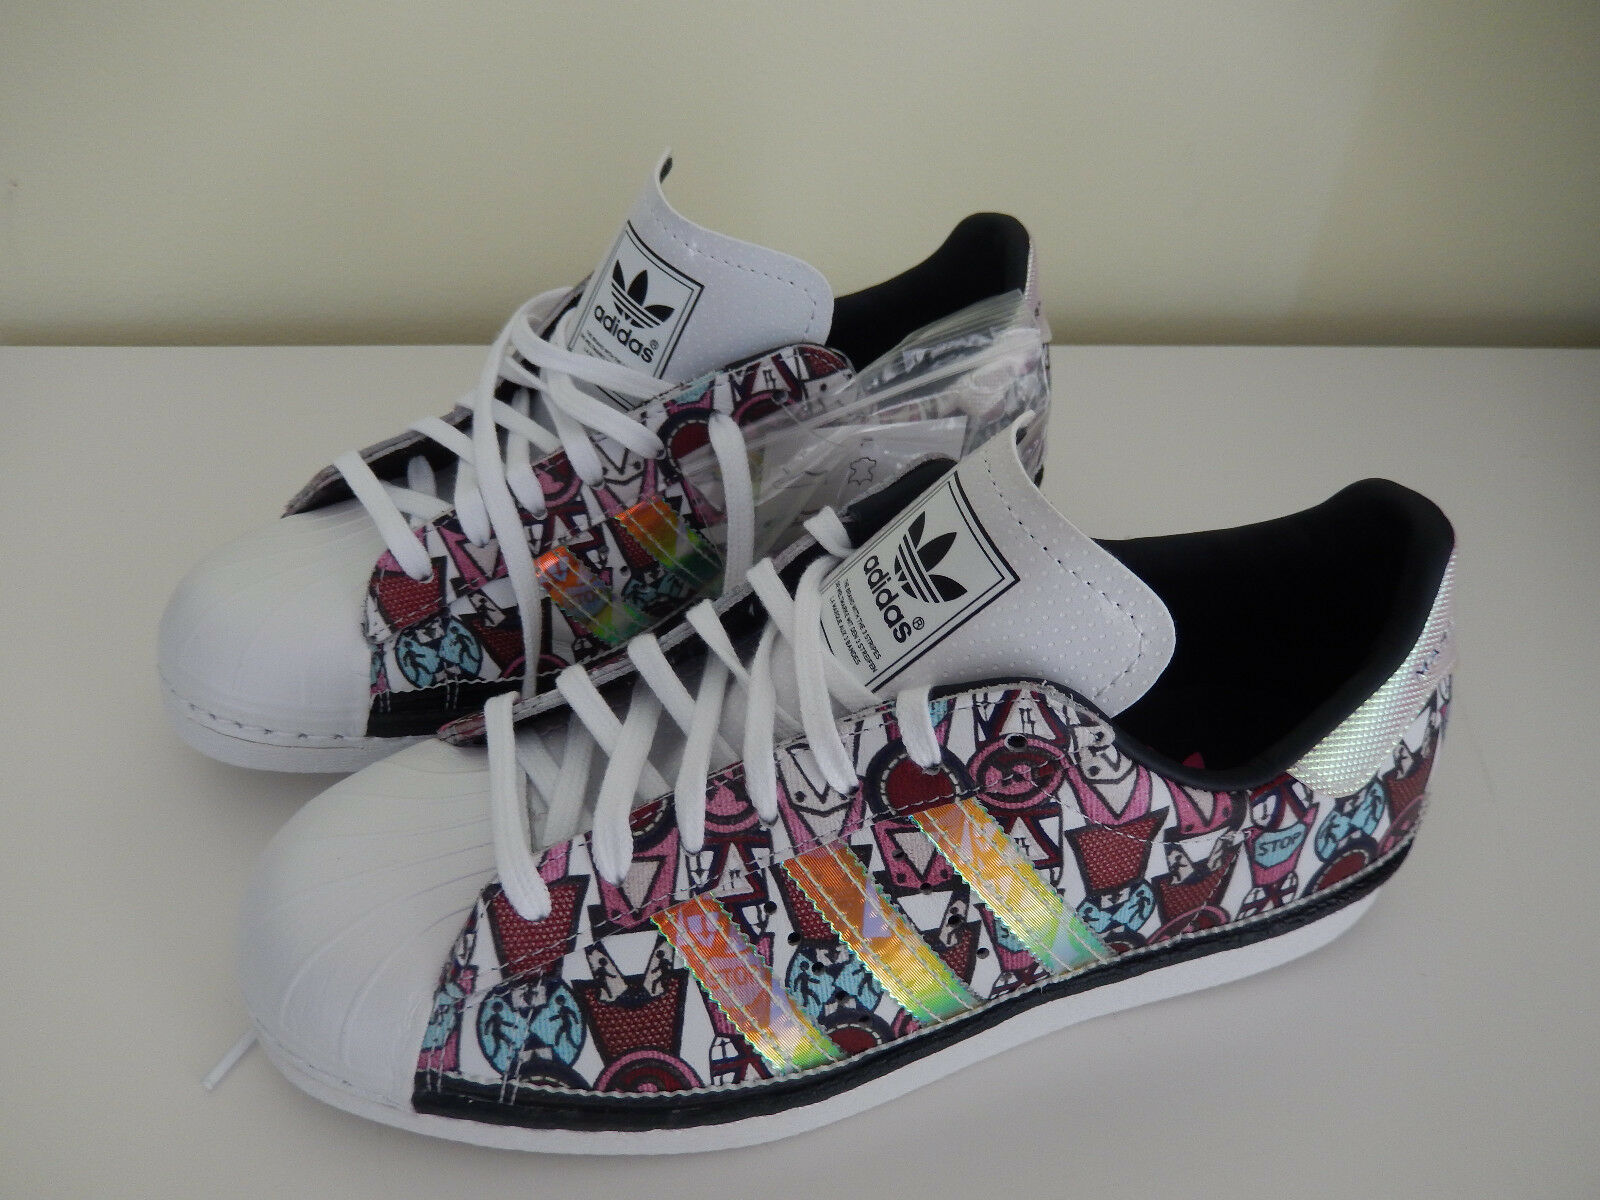 Adidas Mary Katrantzou Superstar Sneakers shoes Womens US 6.5   F 38   NIB